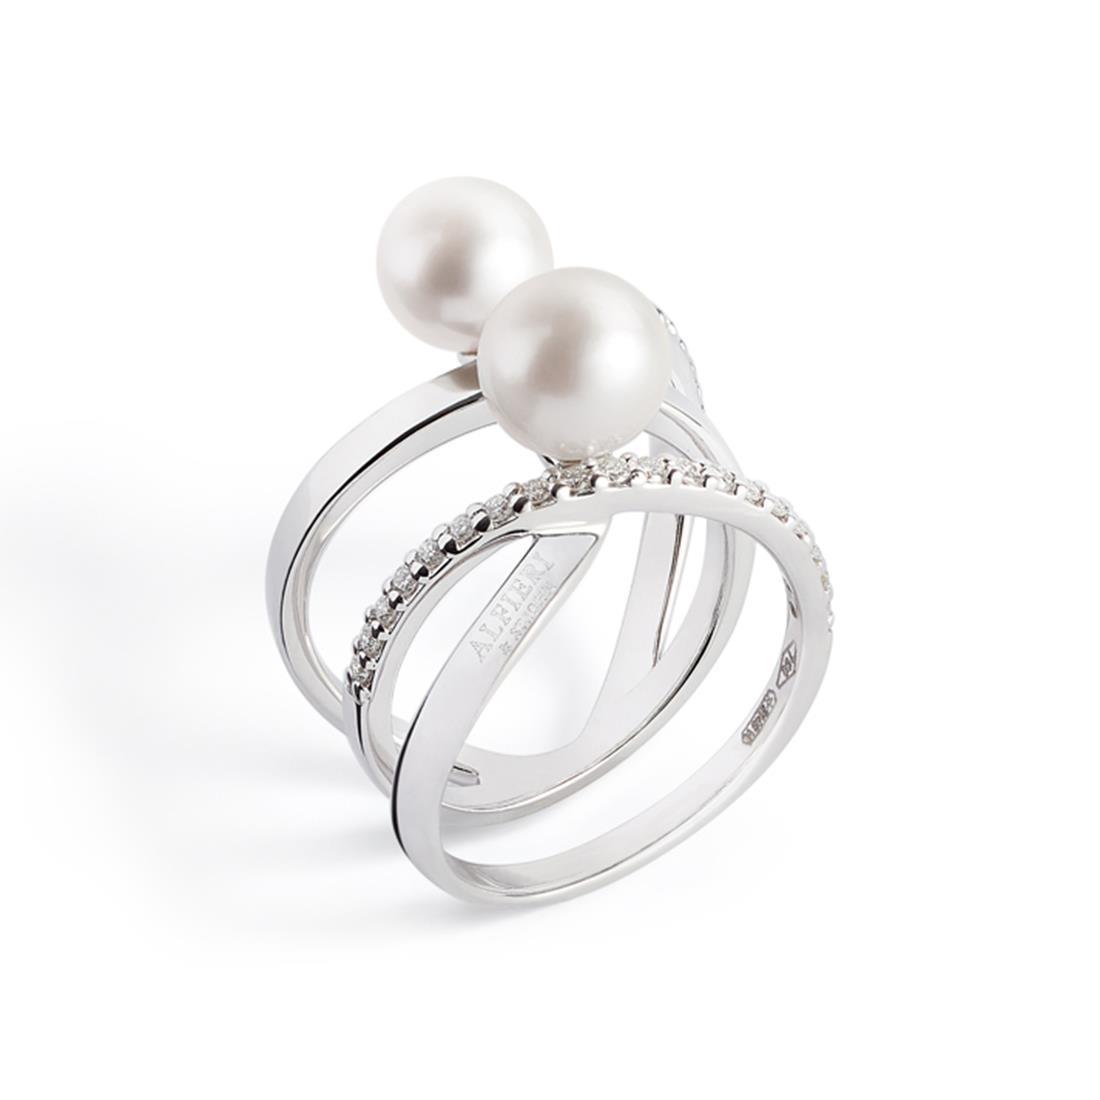 Anello con perle Akoya e diamanti - ALFIERI & ST. JOHN